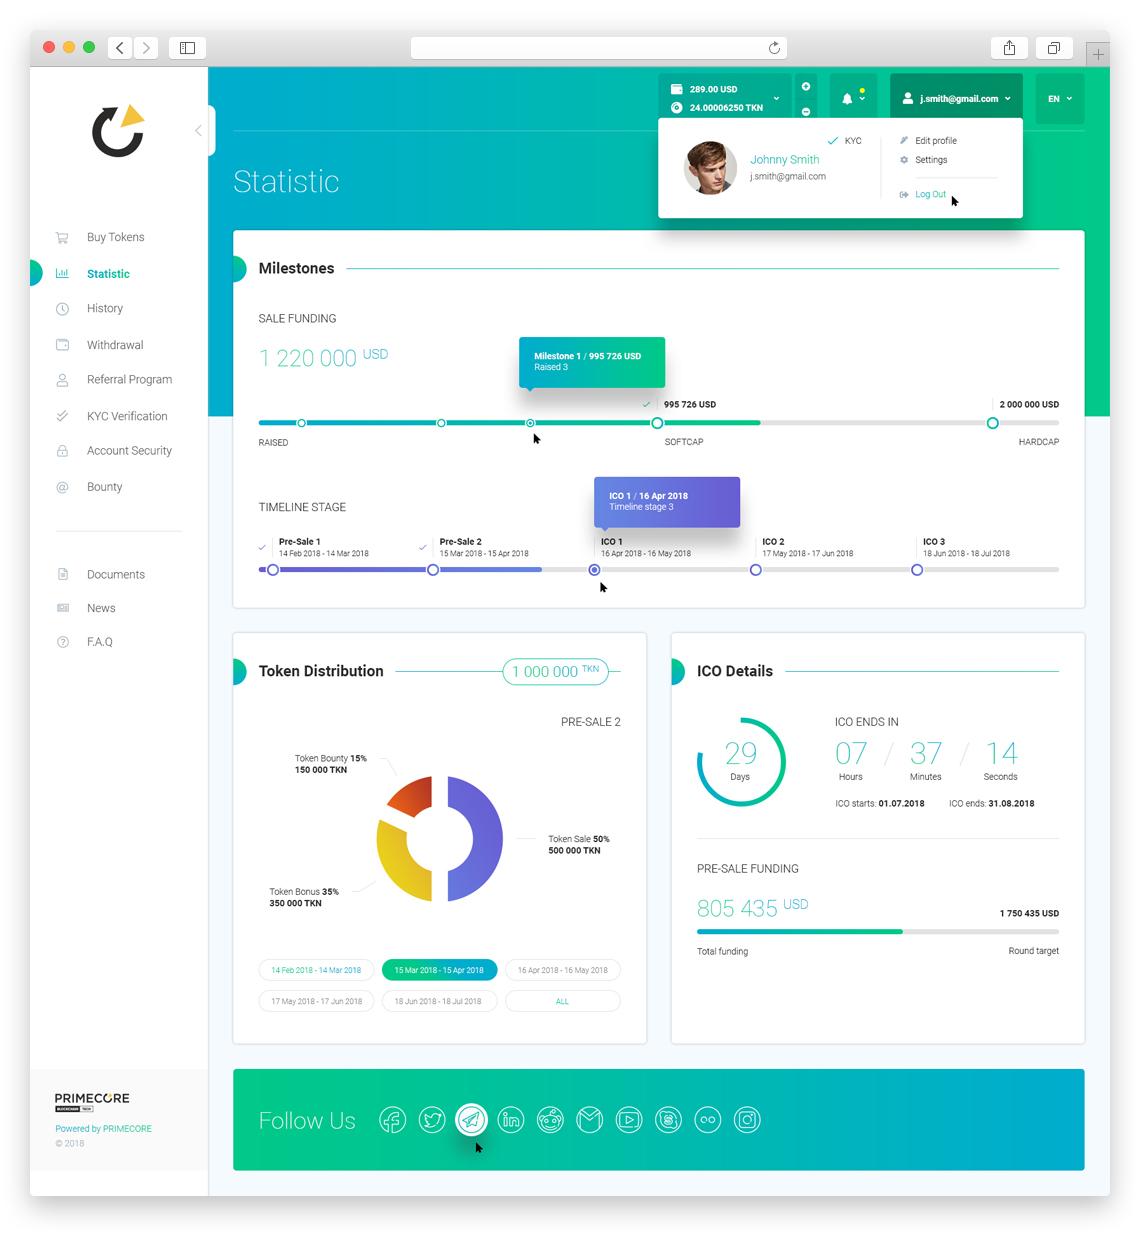 PRIMECORE ICO Platform